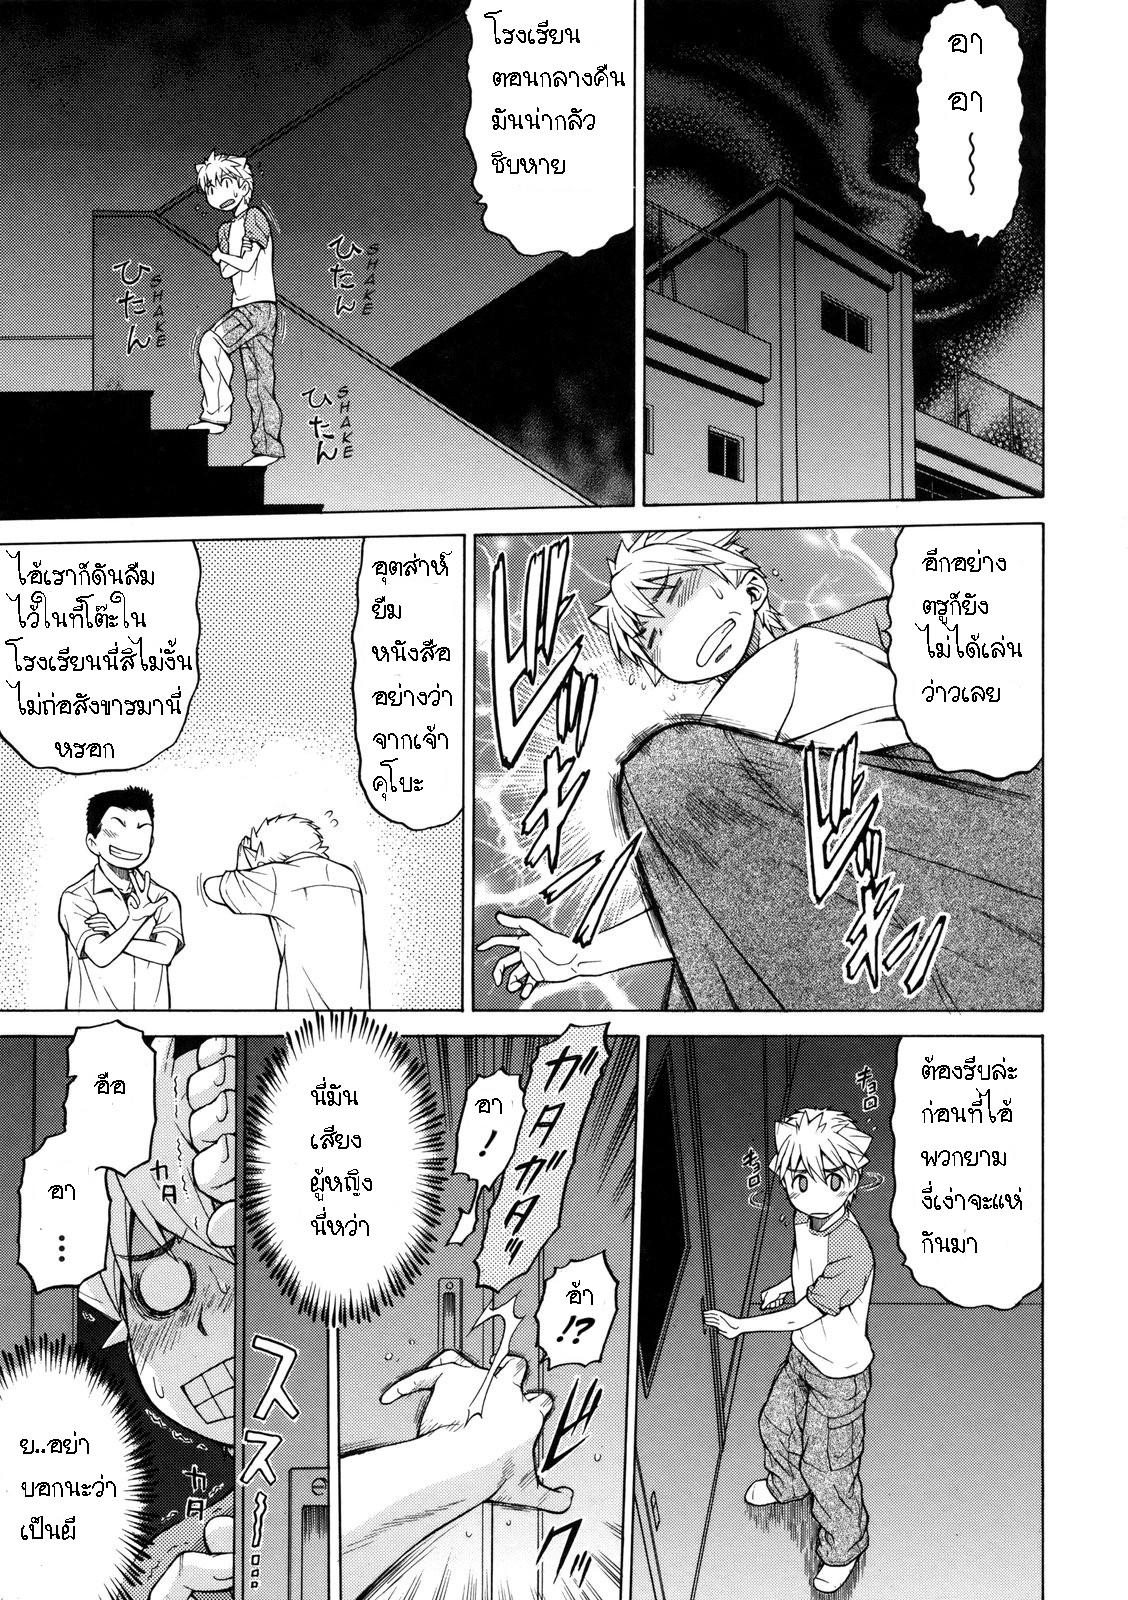 Hajimete no Iinchou | ครั้งแรกของฉันกับหัวหน้าห้อง [Thai ภาษาไทย] [Tsurugi]